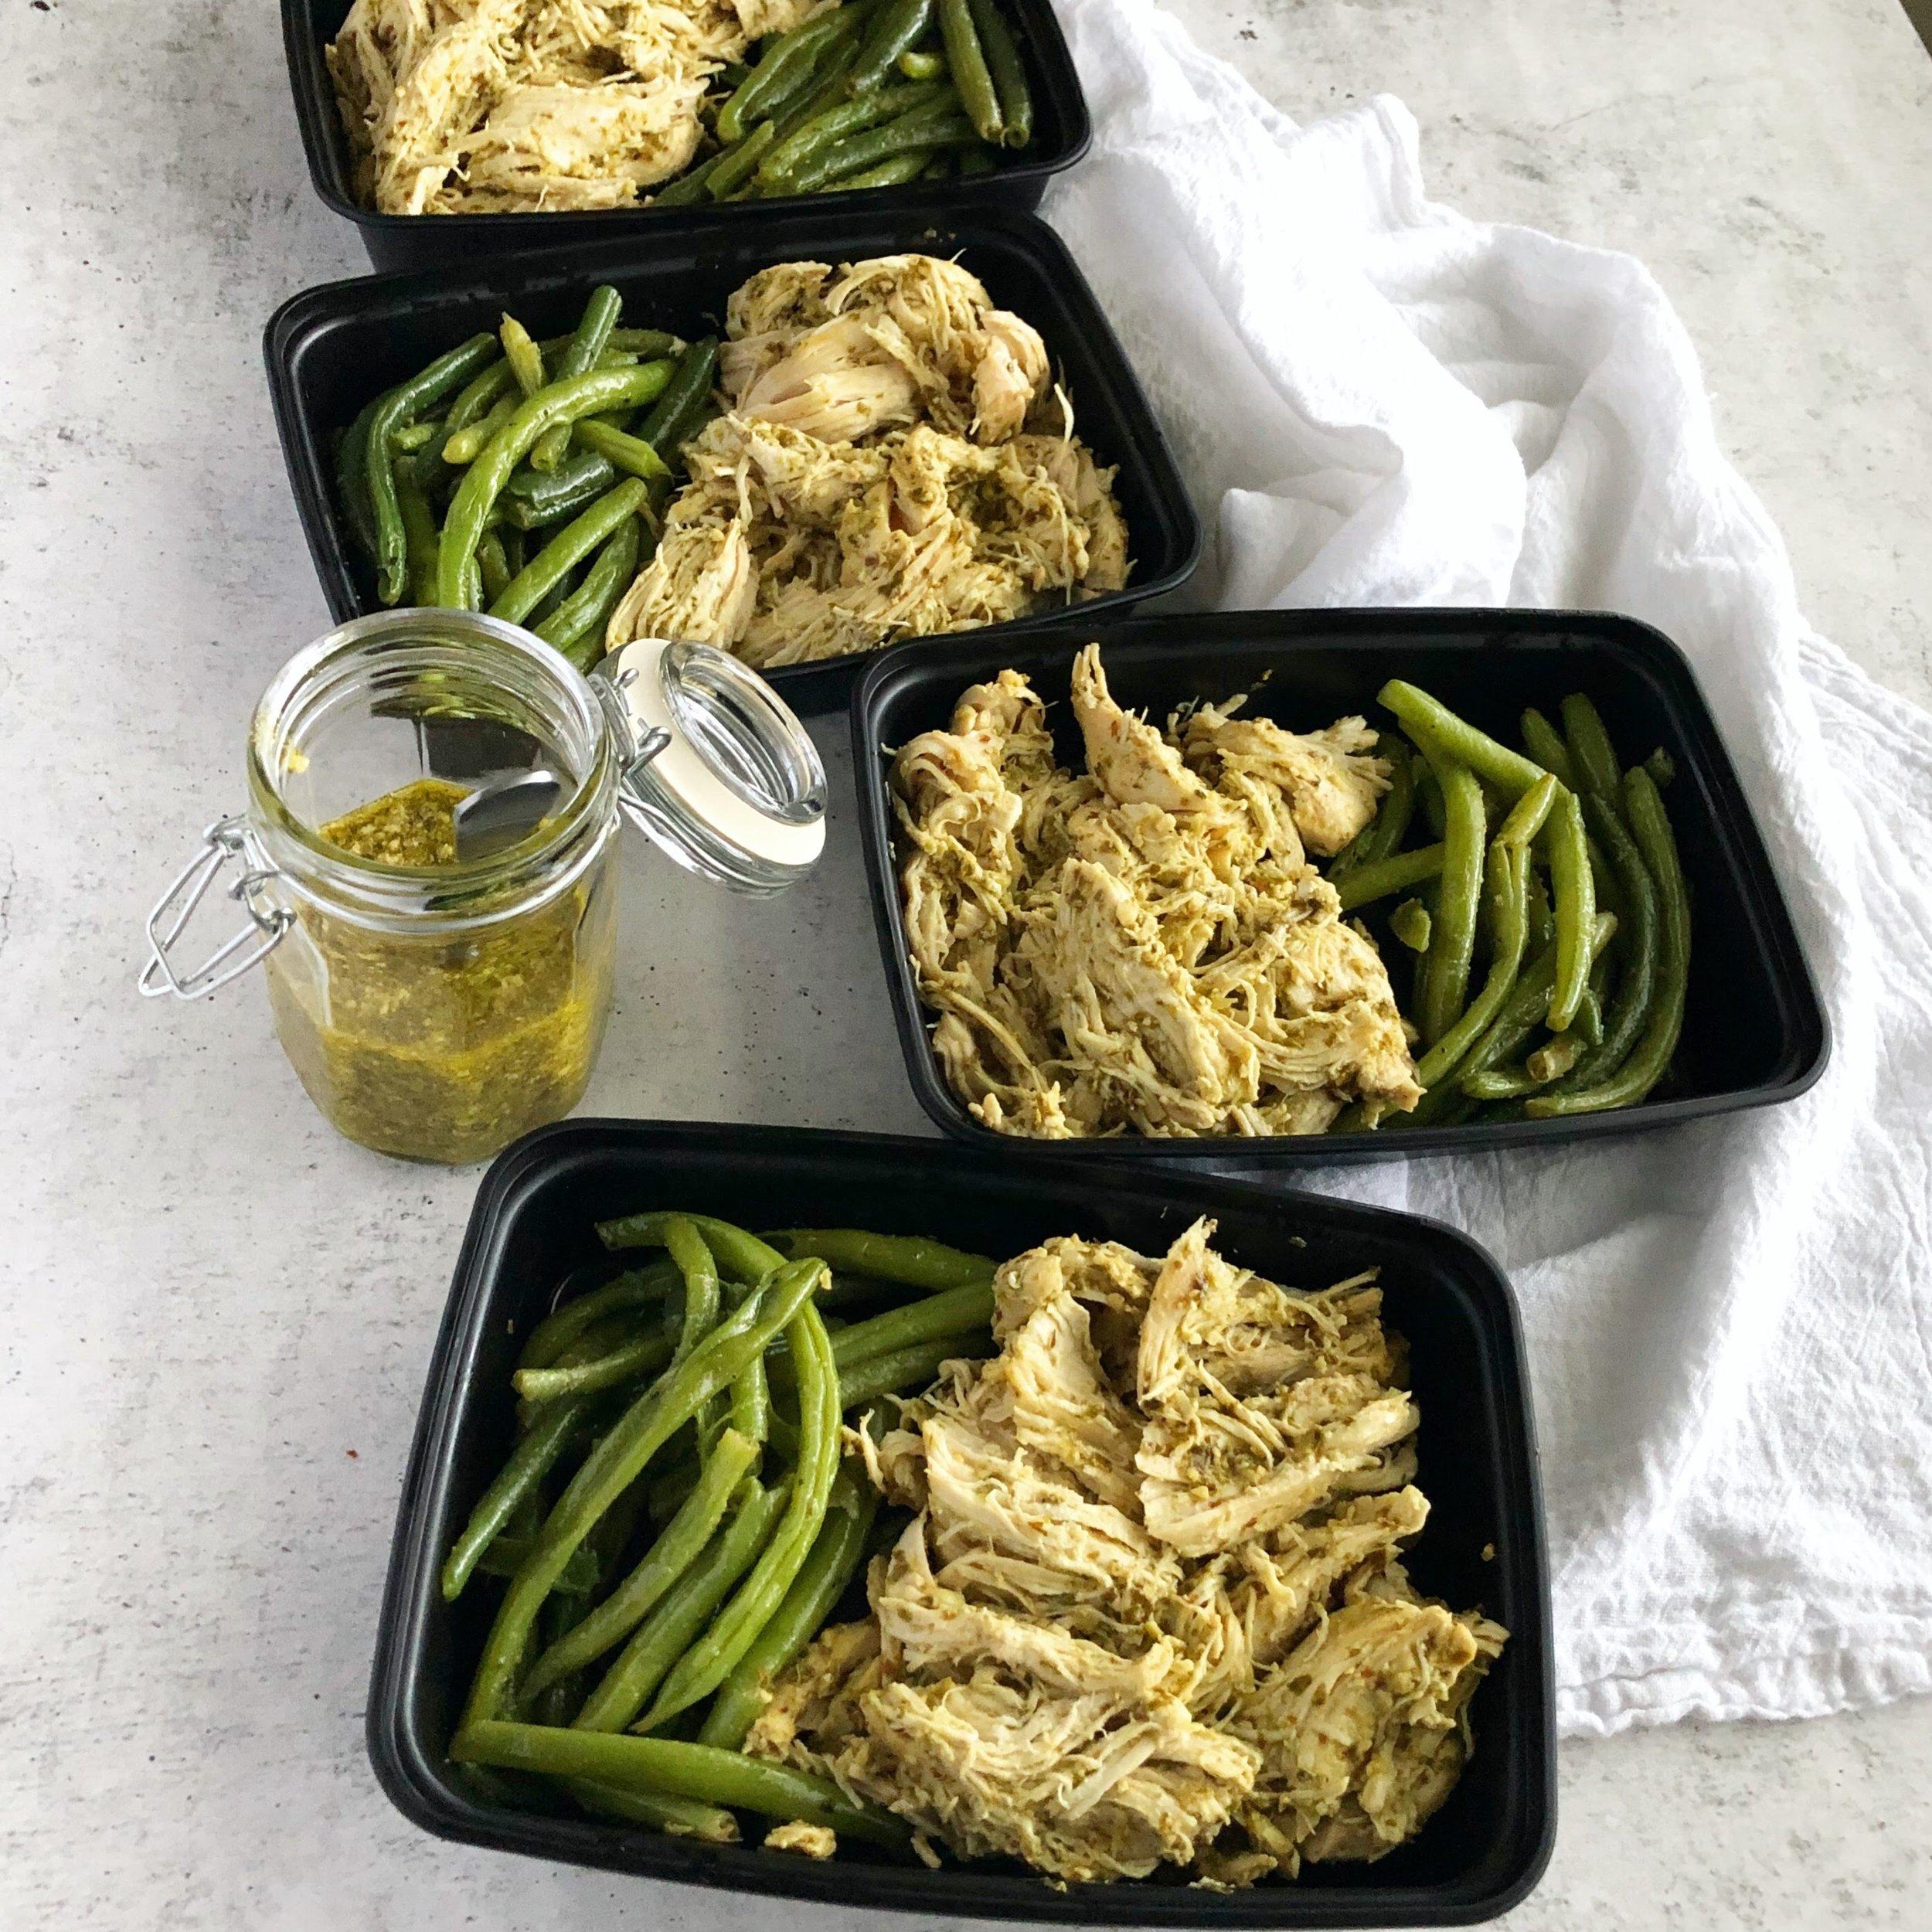 Instant Pot Pesto Chicken, Instant Pot Meal Prep 1